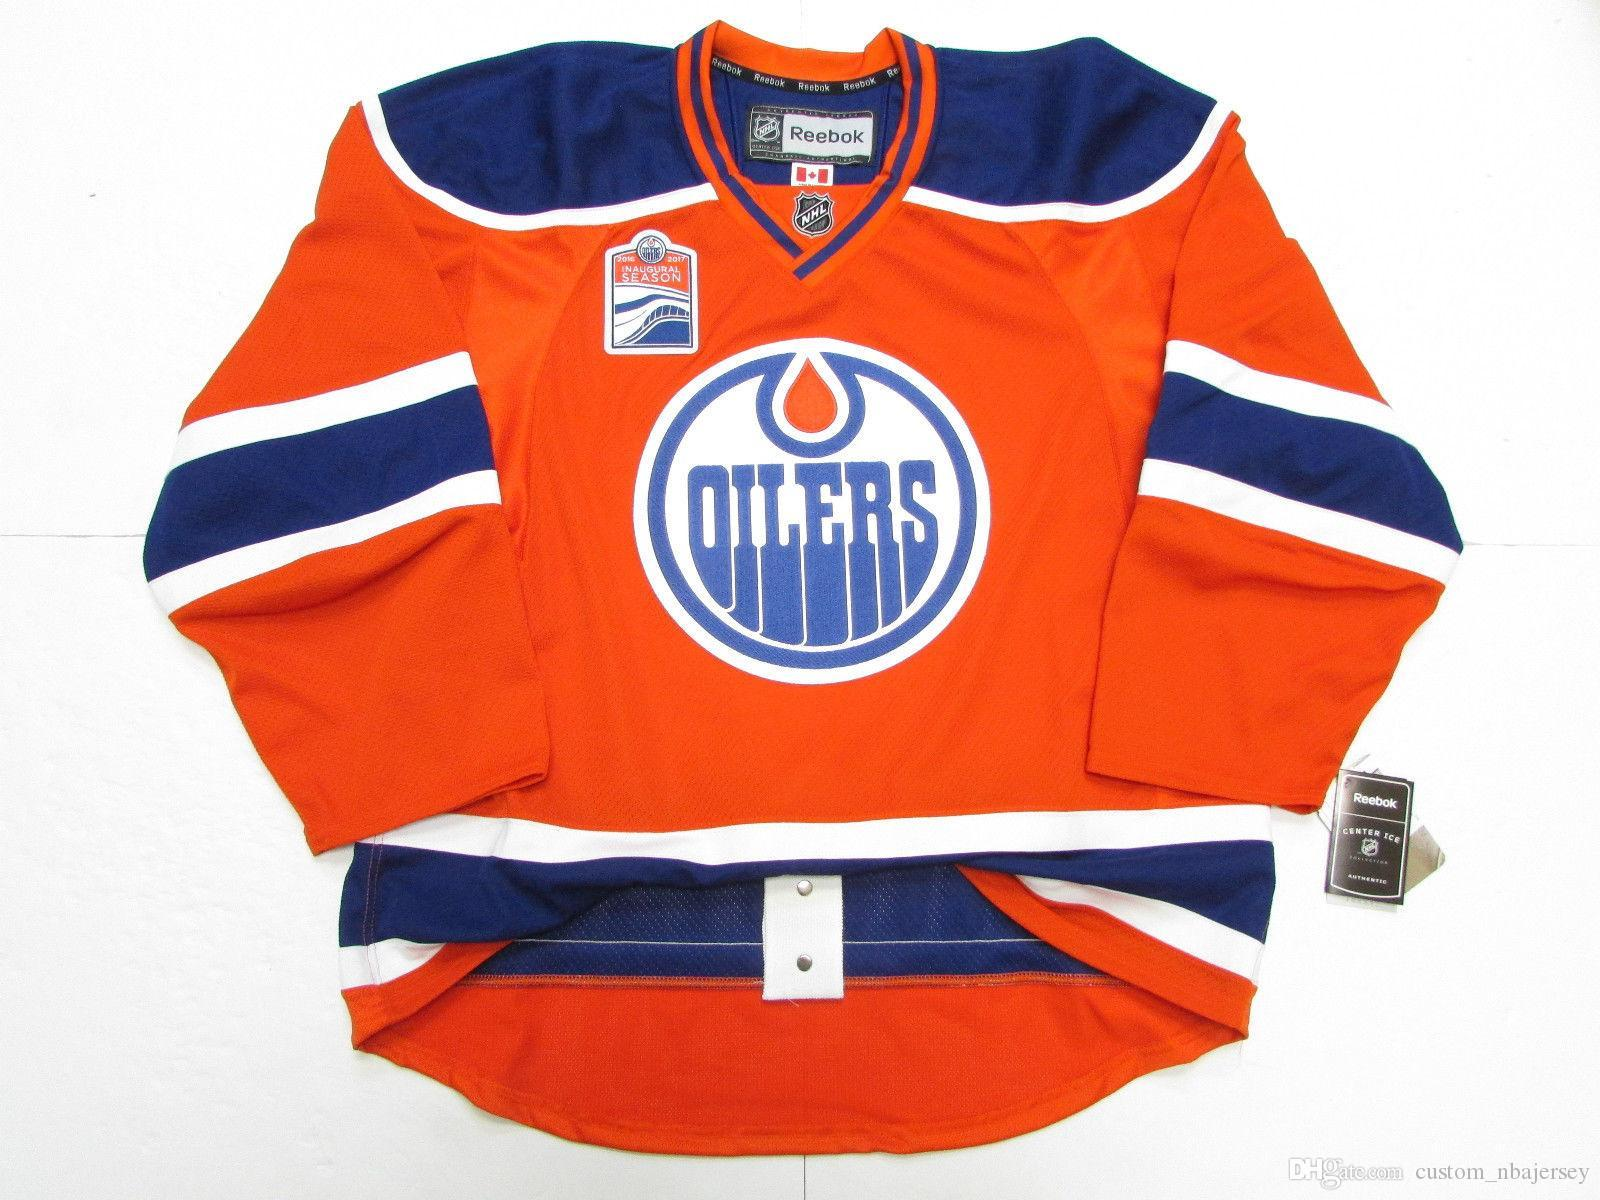 c85e01bbe 2019 Cheap Custom EDMONTON OILERS THIRD INAUGURAL SEASON JERSEY Stitch Add  Any Number Any Name Mens Hockey Jersey XS 5XL From Custom_nbajersey, ...